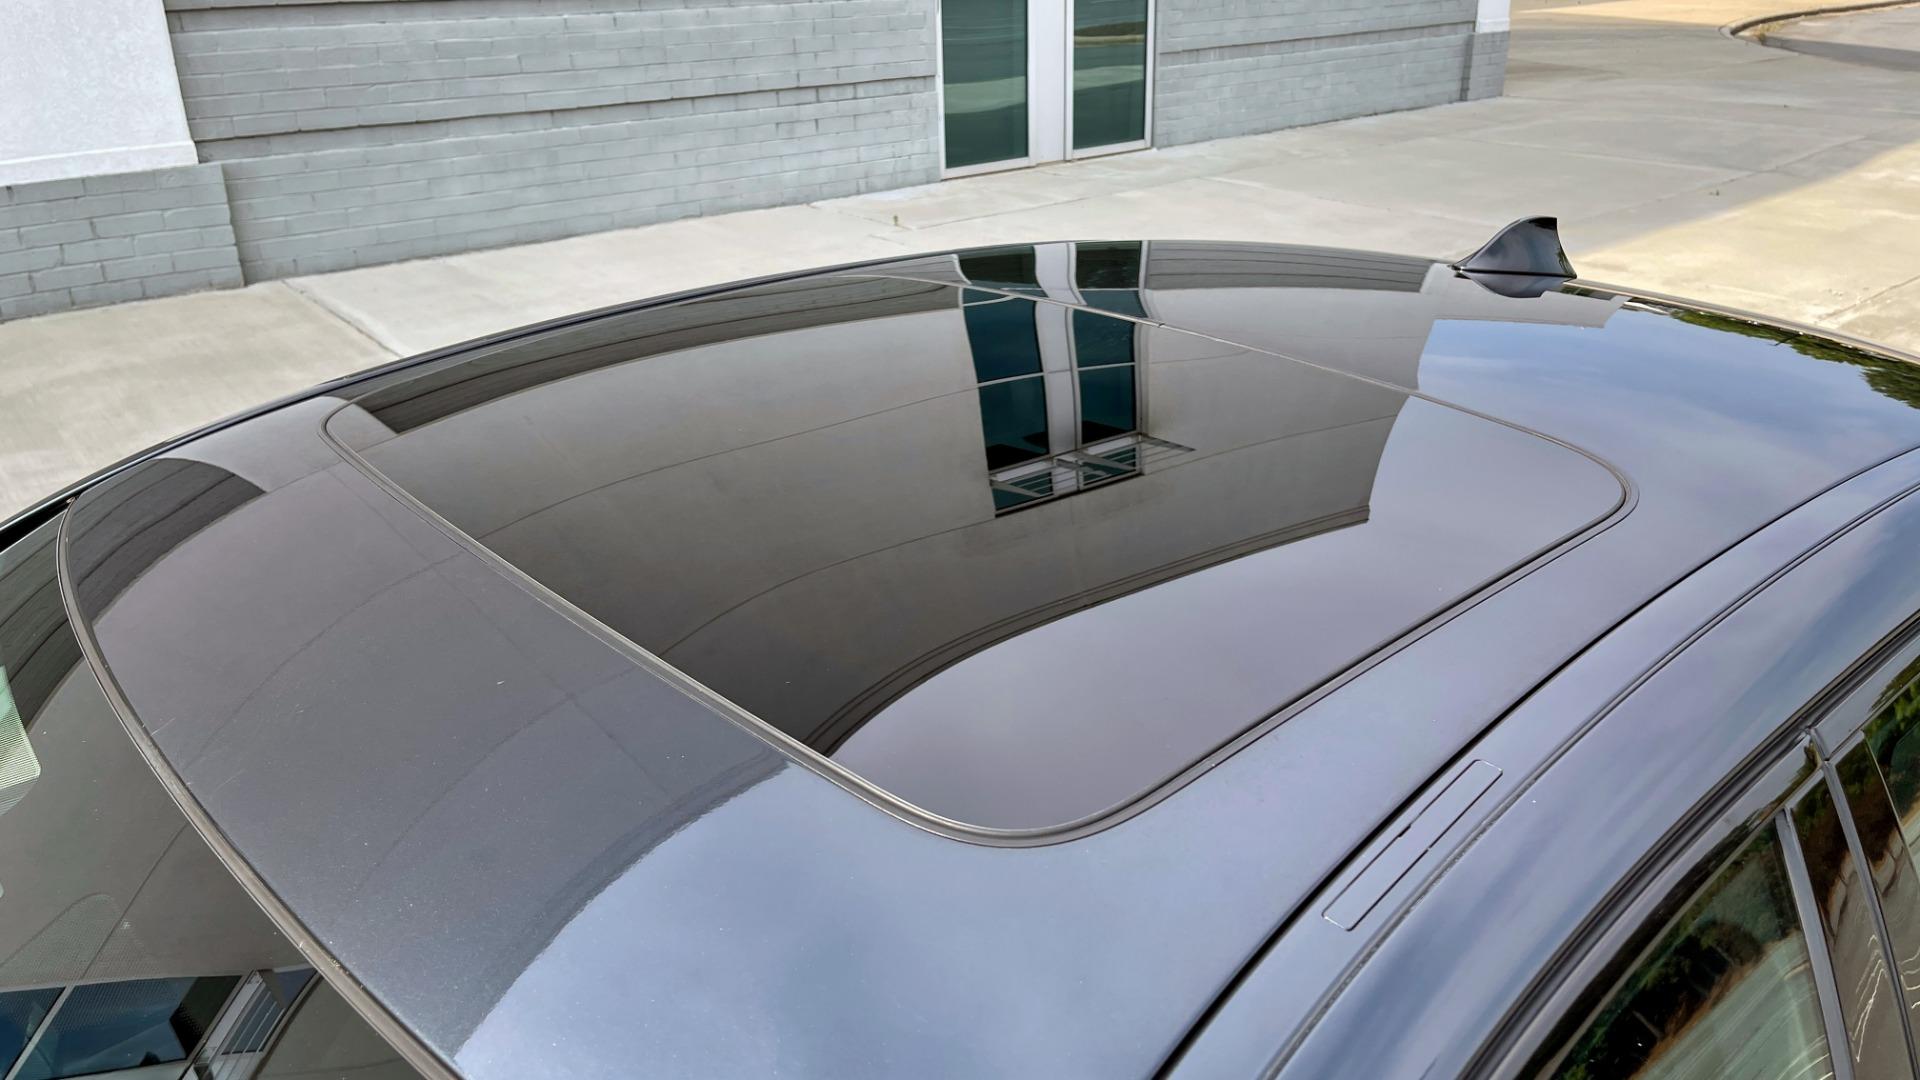 Used 2015 BMW M5 SEDAN / EXEC PKG / HUD / NAV / B&O SND / SUNROOF / REARVIEW for sale Sold at Formula Imports in Charlotte NC 28227 10